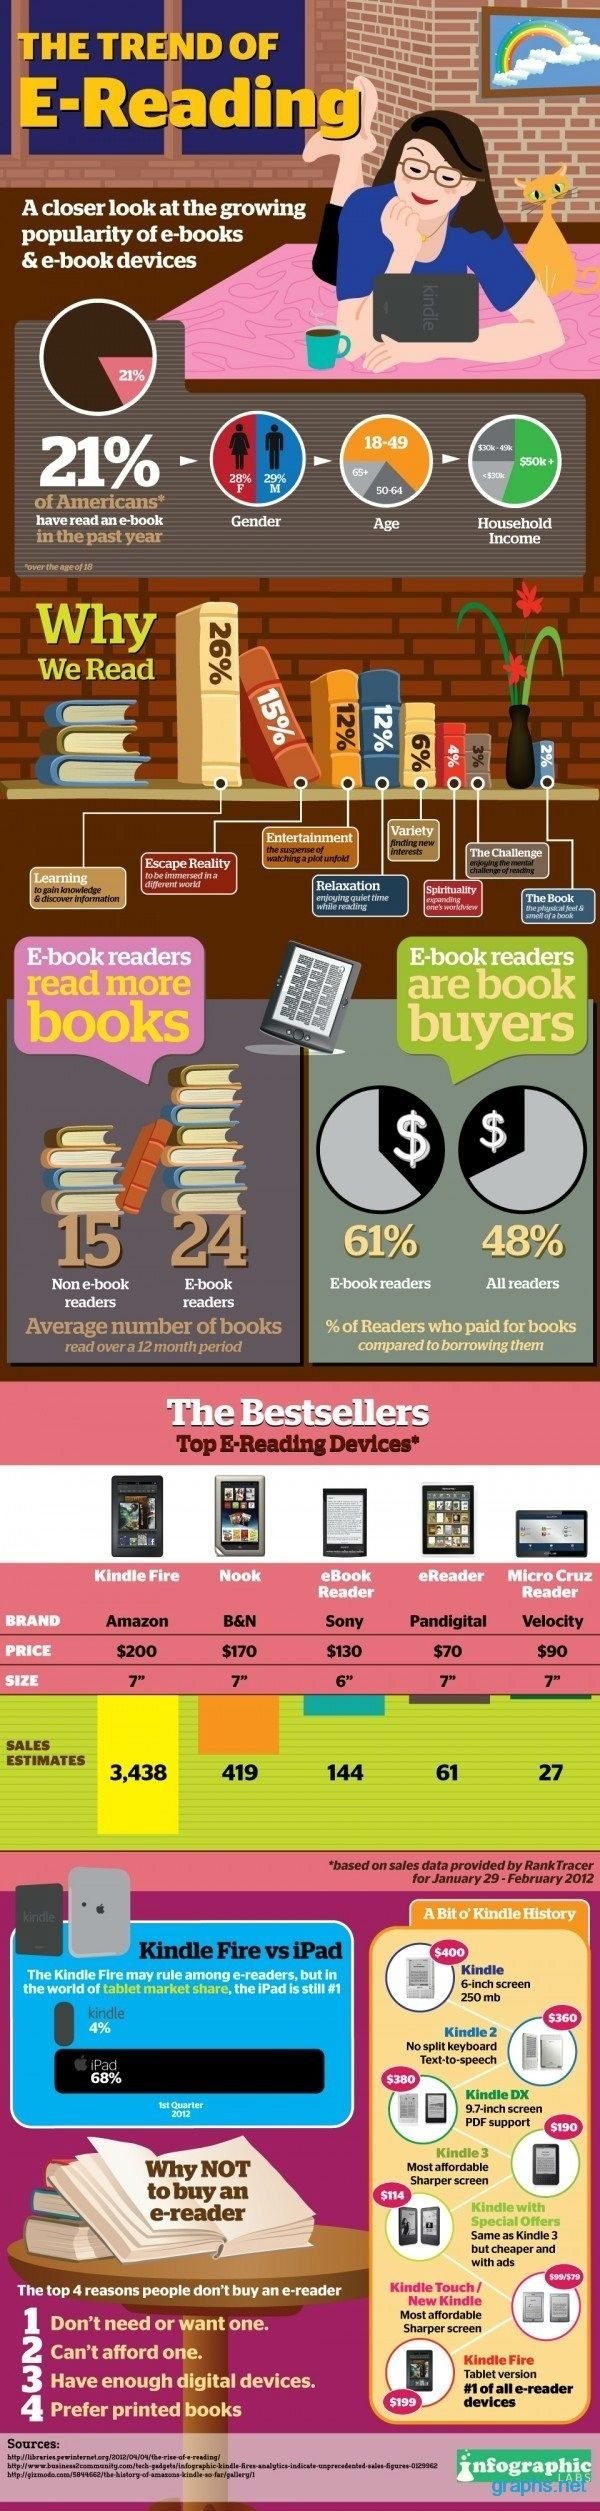 best books etc images on pinterest bookcases amazon kindle